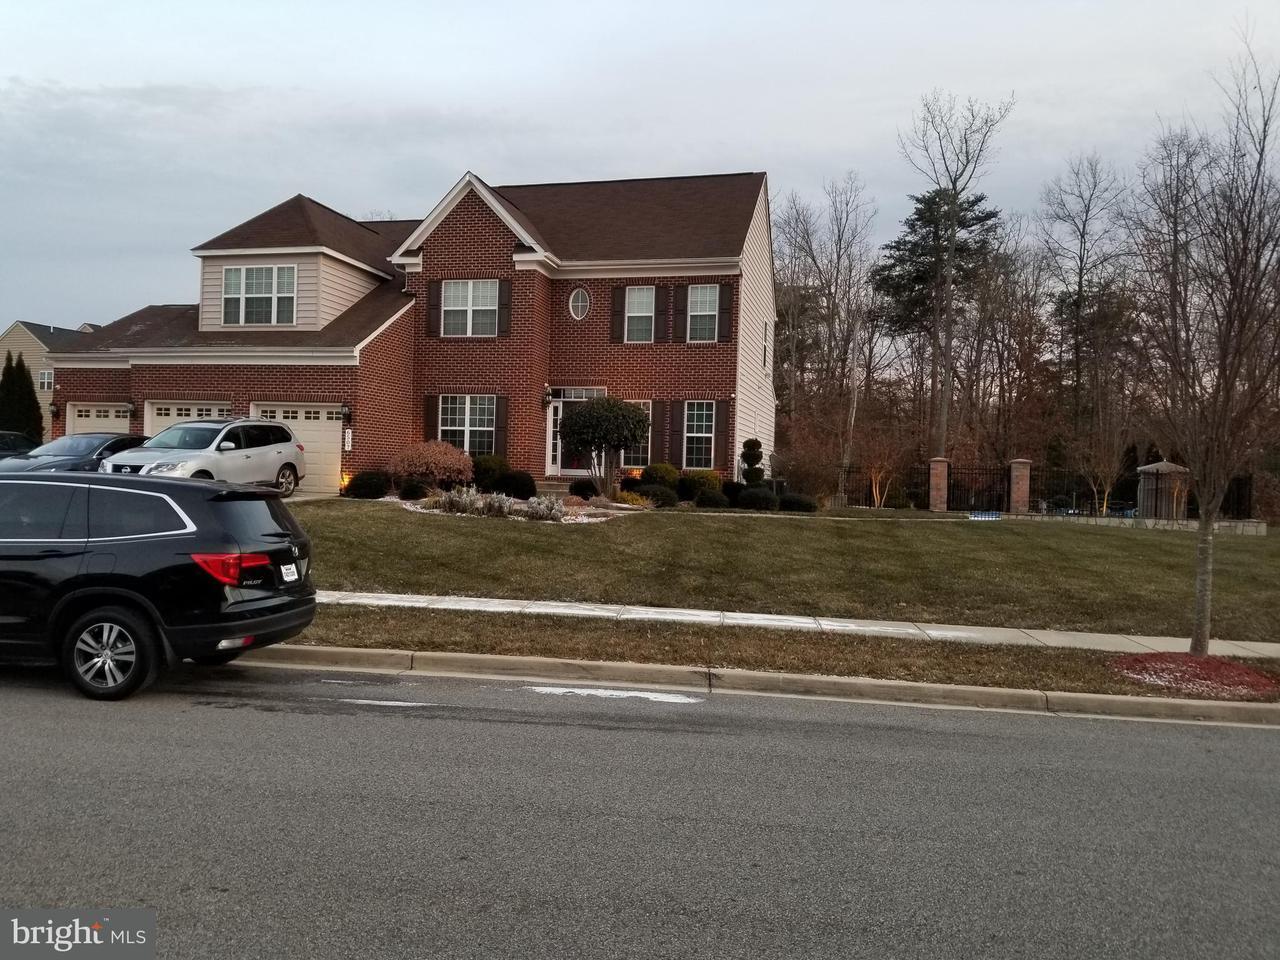 Частный односемейный дом для того Продажа на 6507 CHATHAM PARK Drive 6507 CHATHAM PARK Drive Brandywine, Мэриленд 20613 Соединенные Штаты